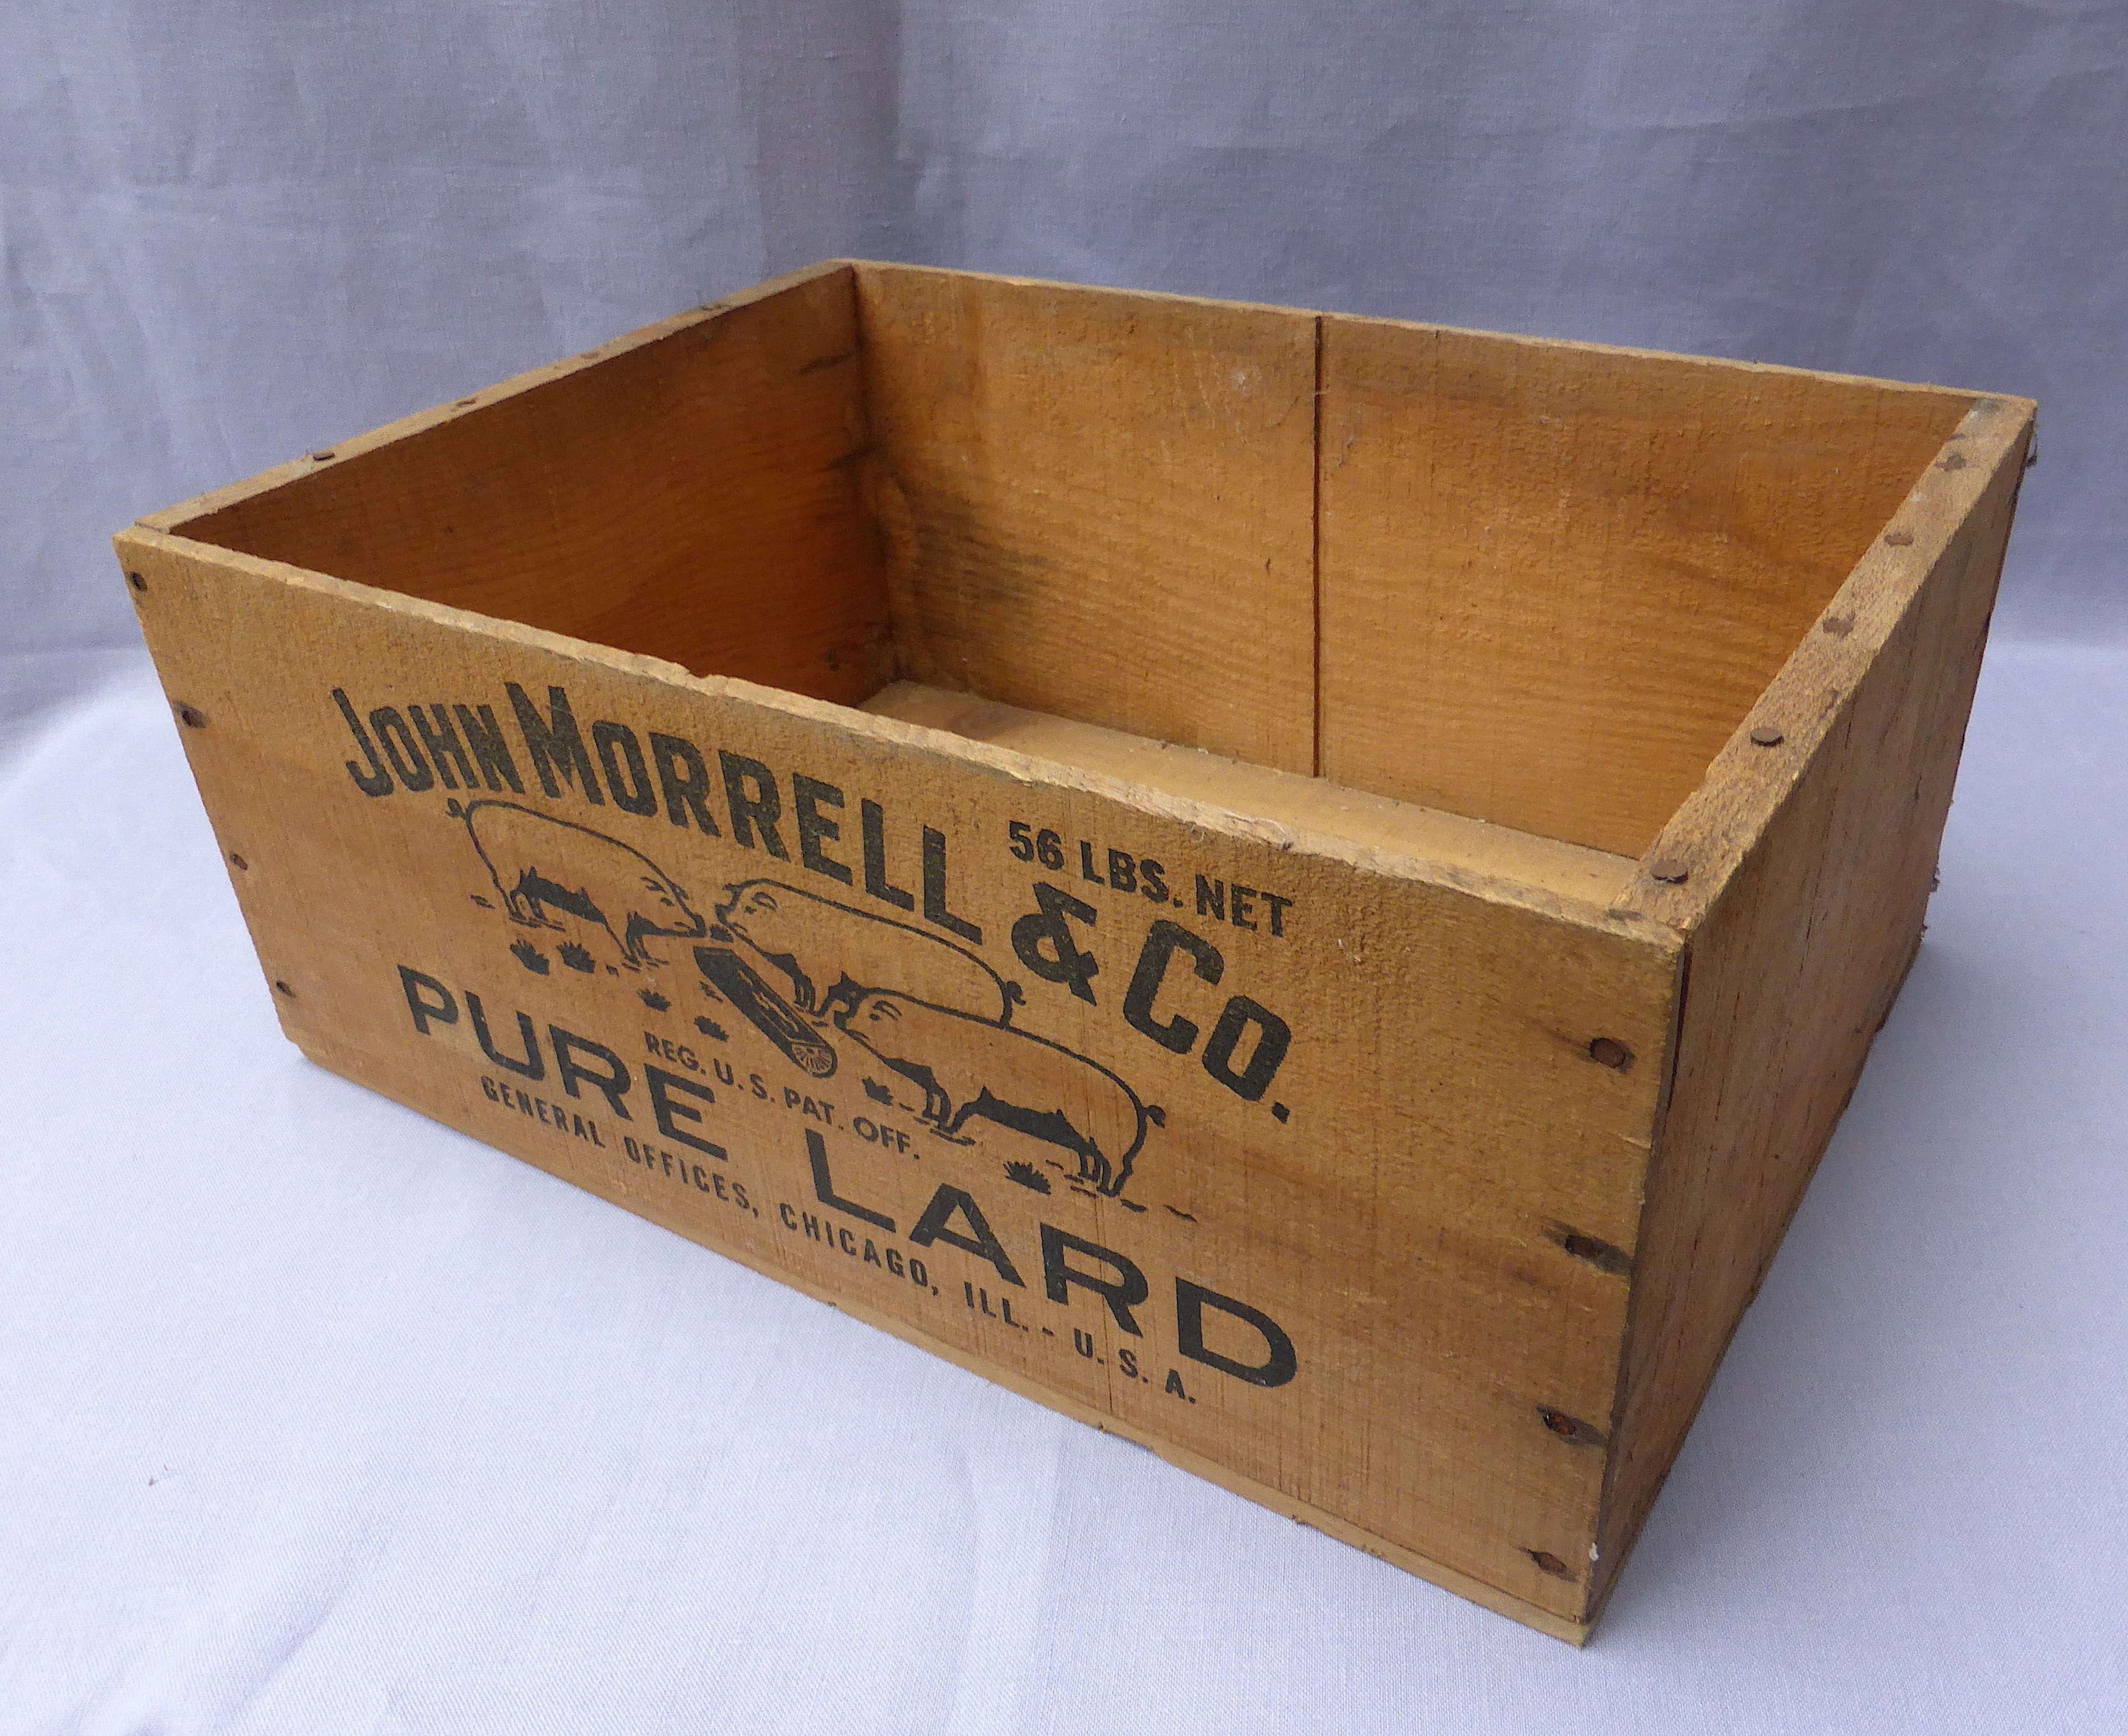 Vintage John Morrell lard crate